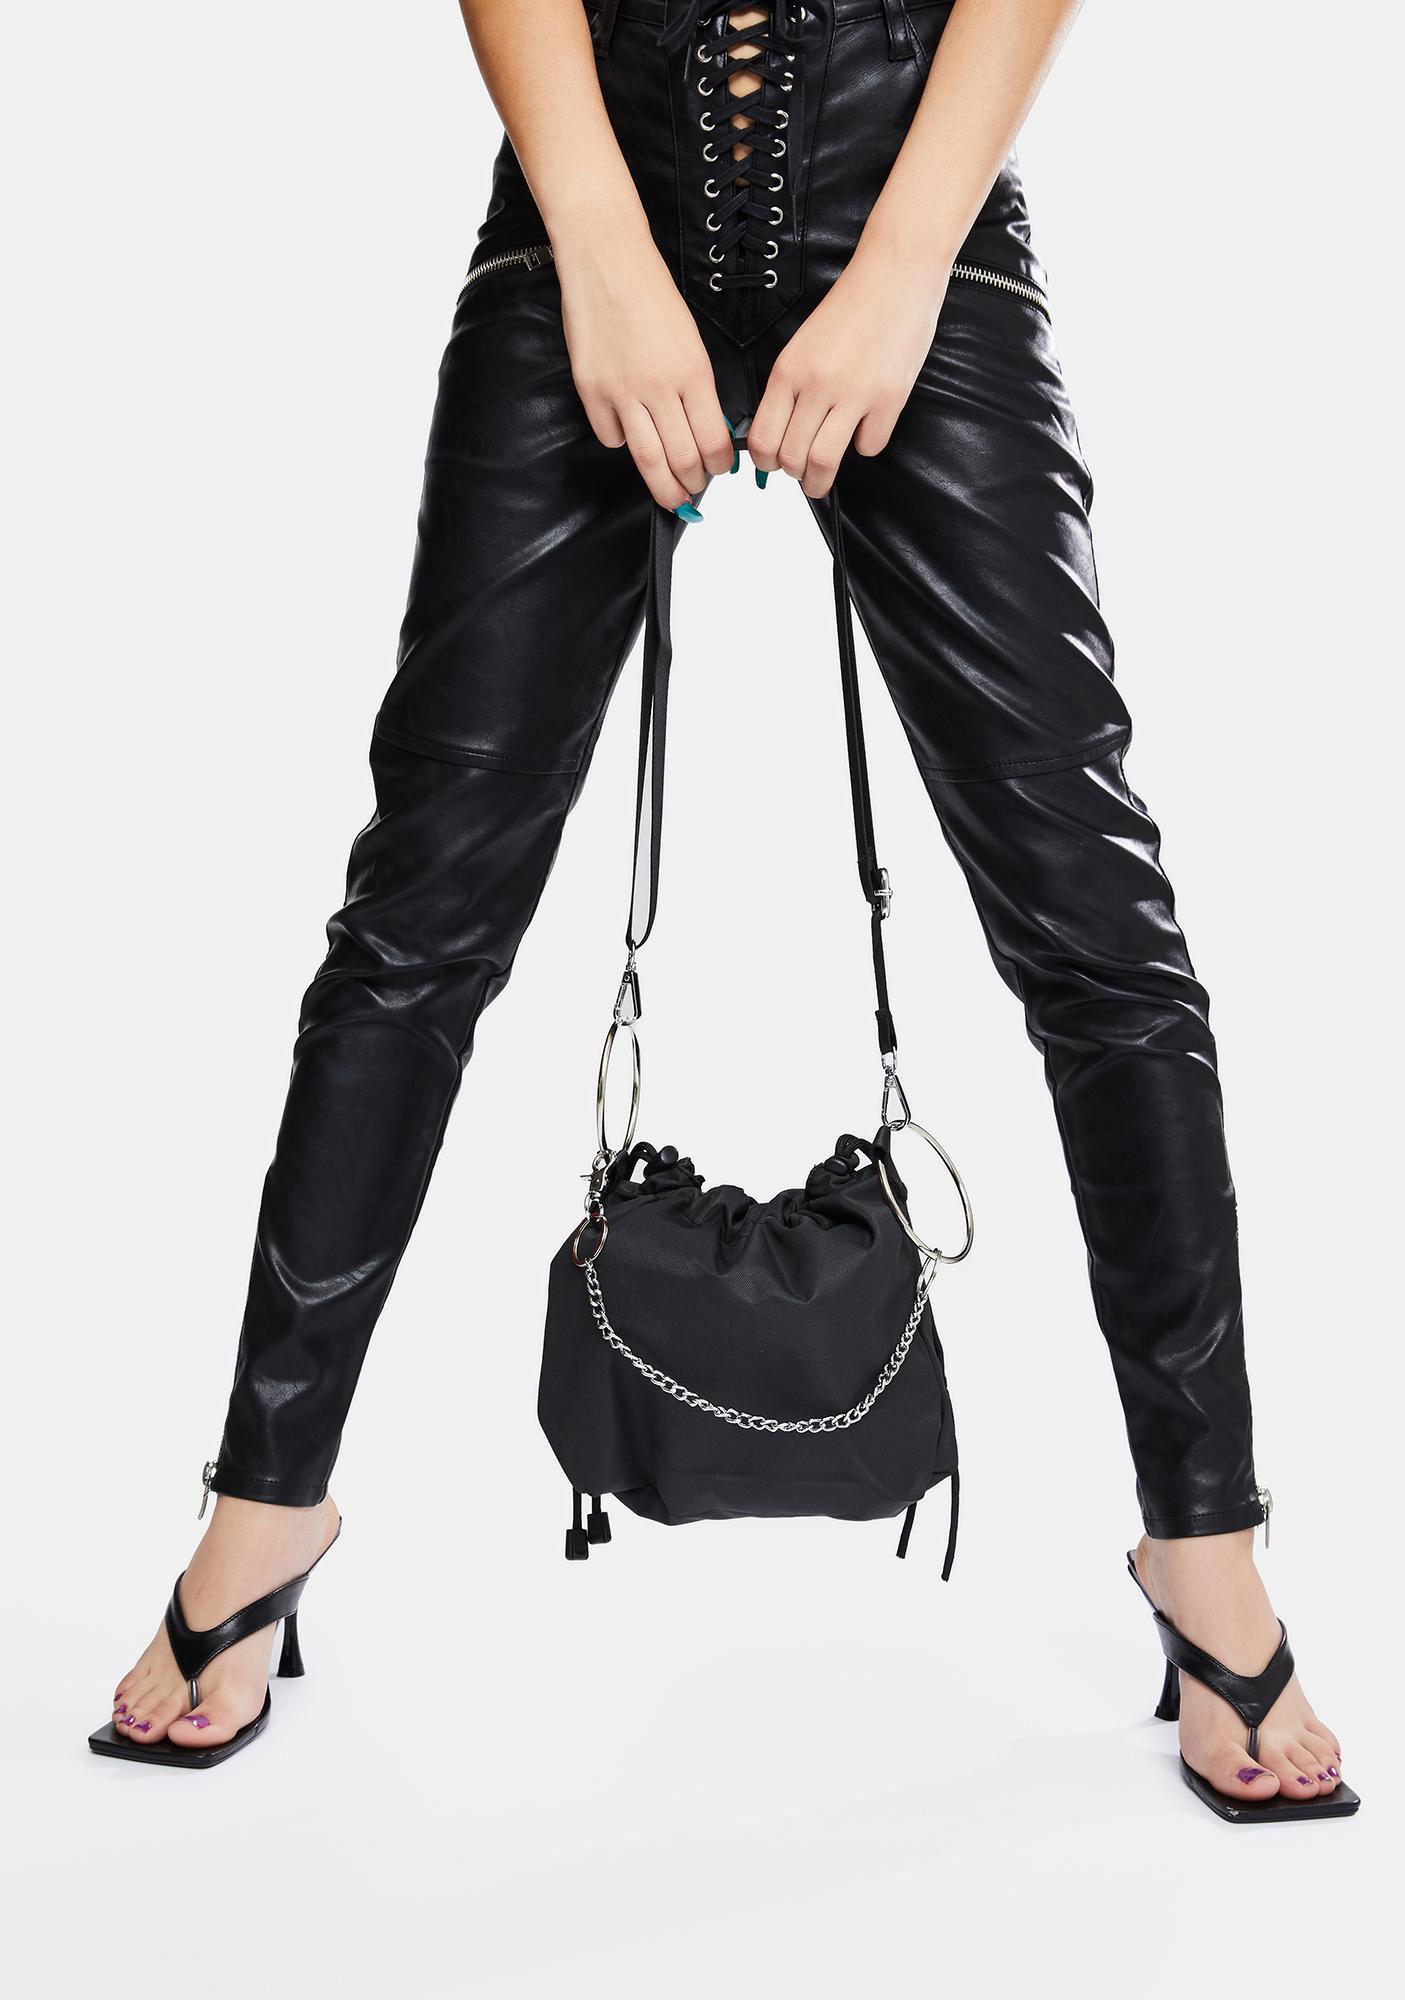 Baby Please O-Ring Handbag